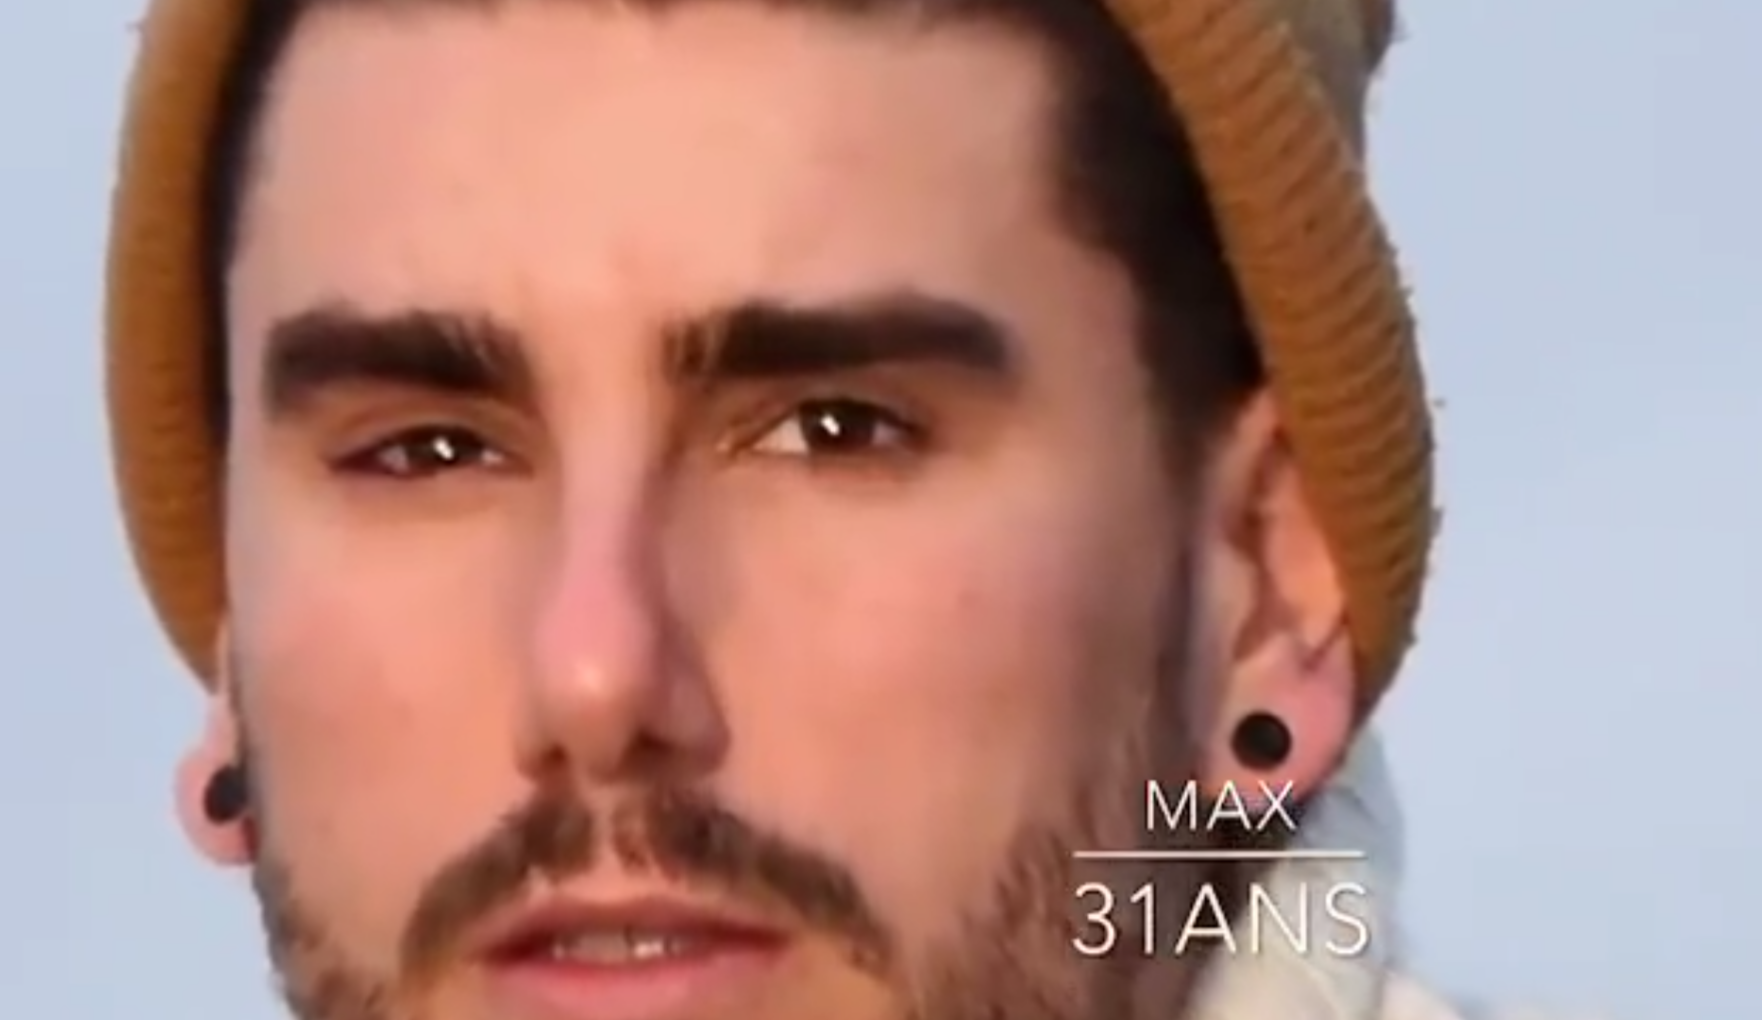 Max, Candidat à Mister Bear Rhône Alpes Auvergne 2018